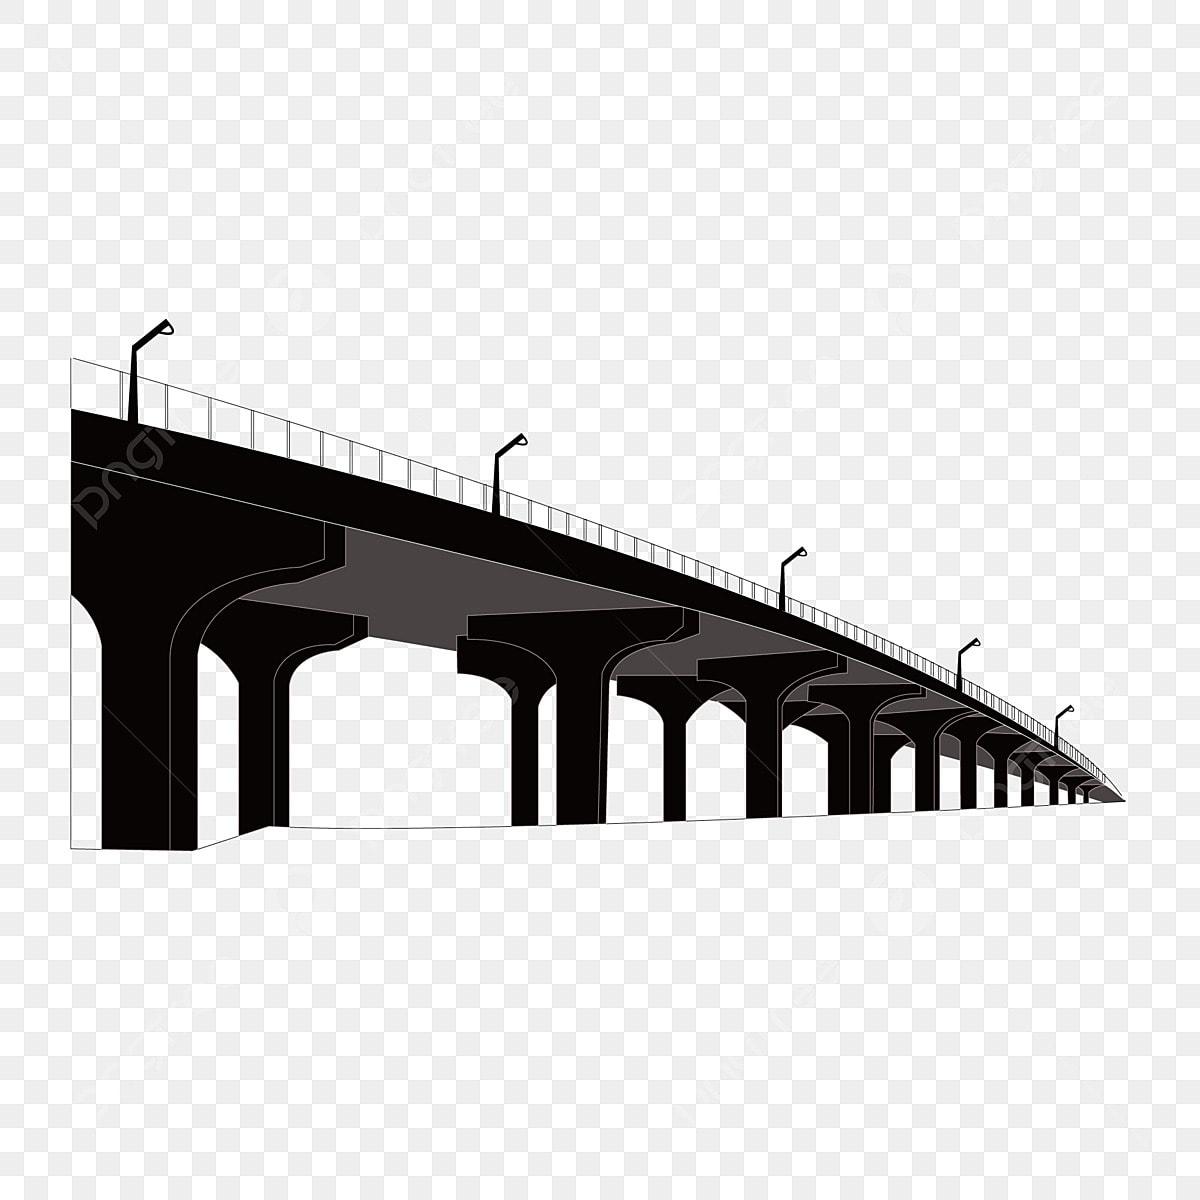 Bridge Silhouette Bridge Bridge Silhouette, Building